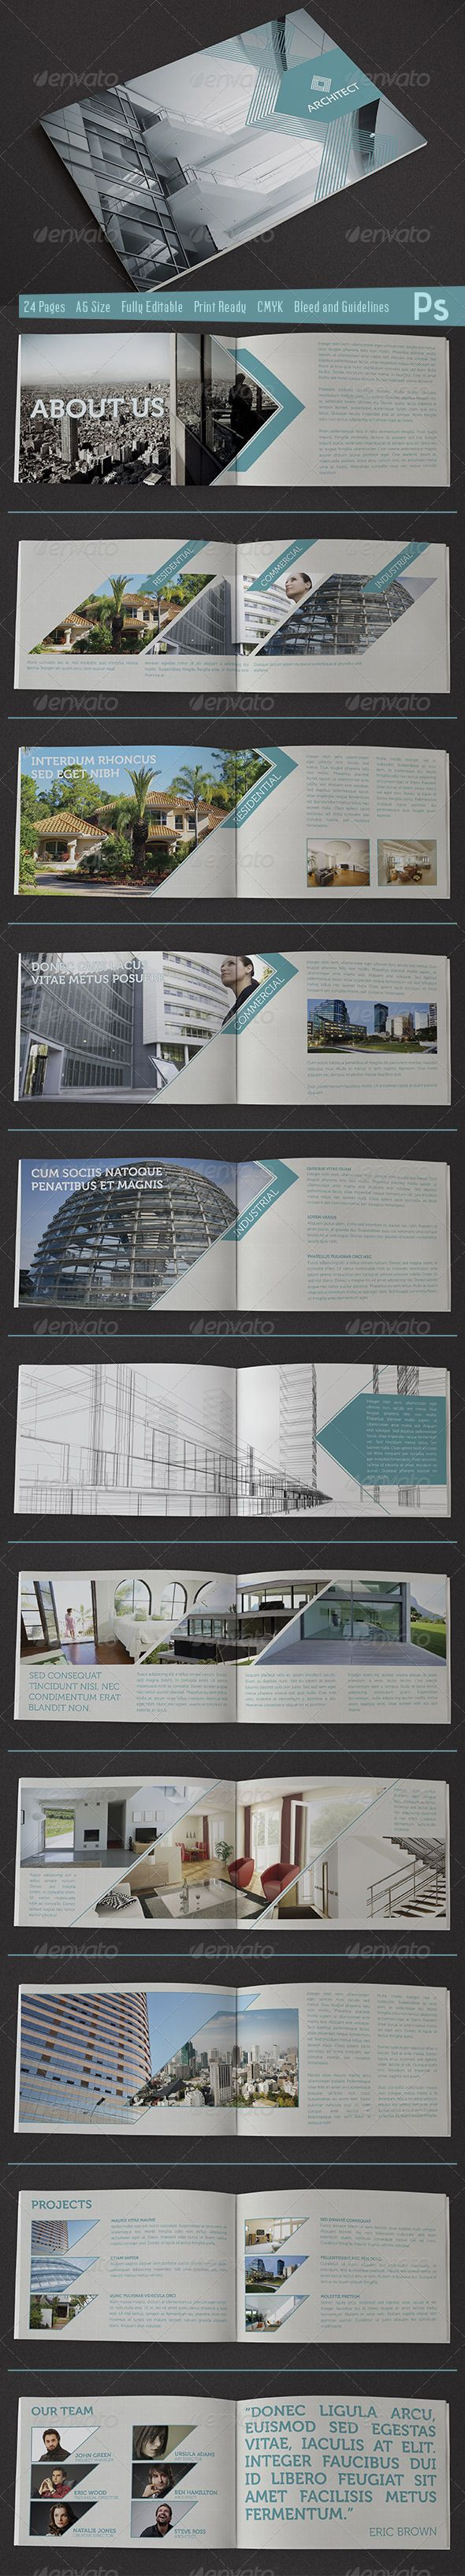 brosch re f r architekt brochure design pinte. Black Bedroom Furniture Sets. Home Design Ideas